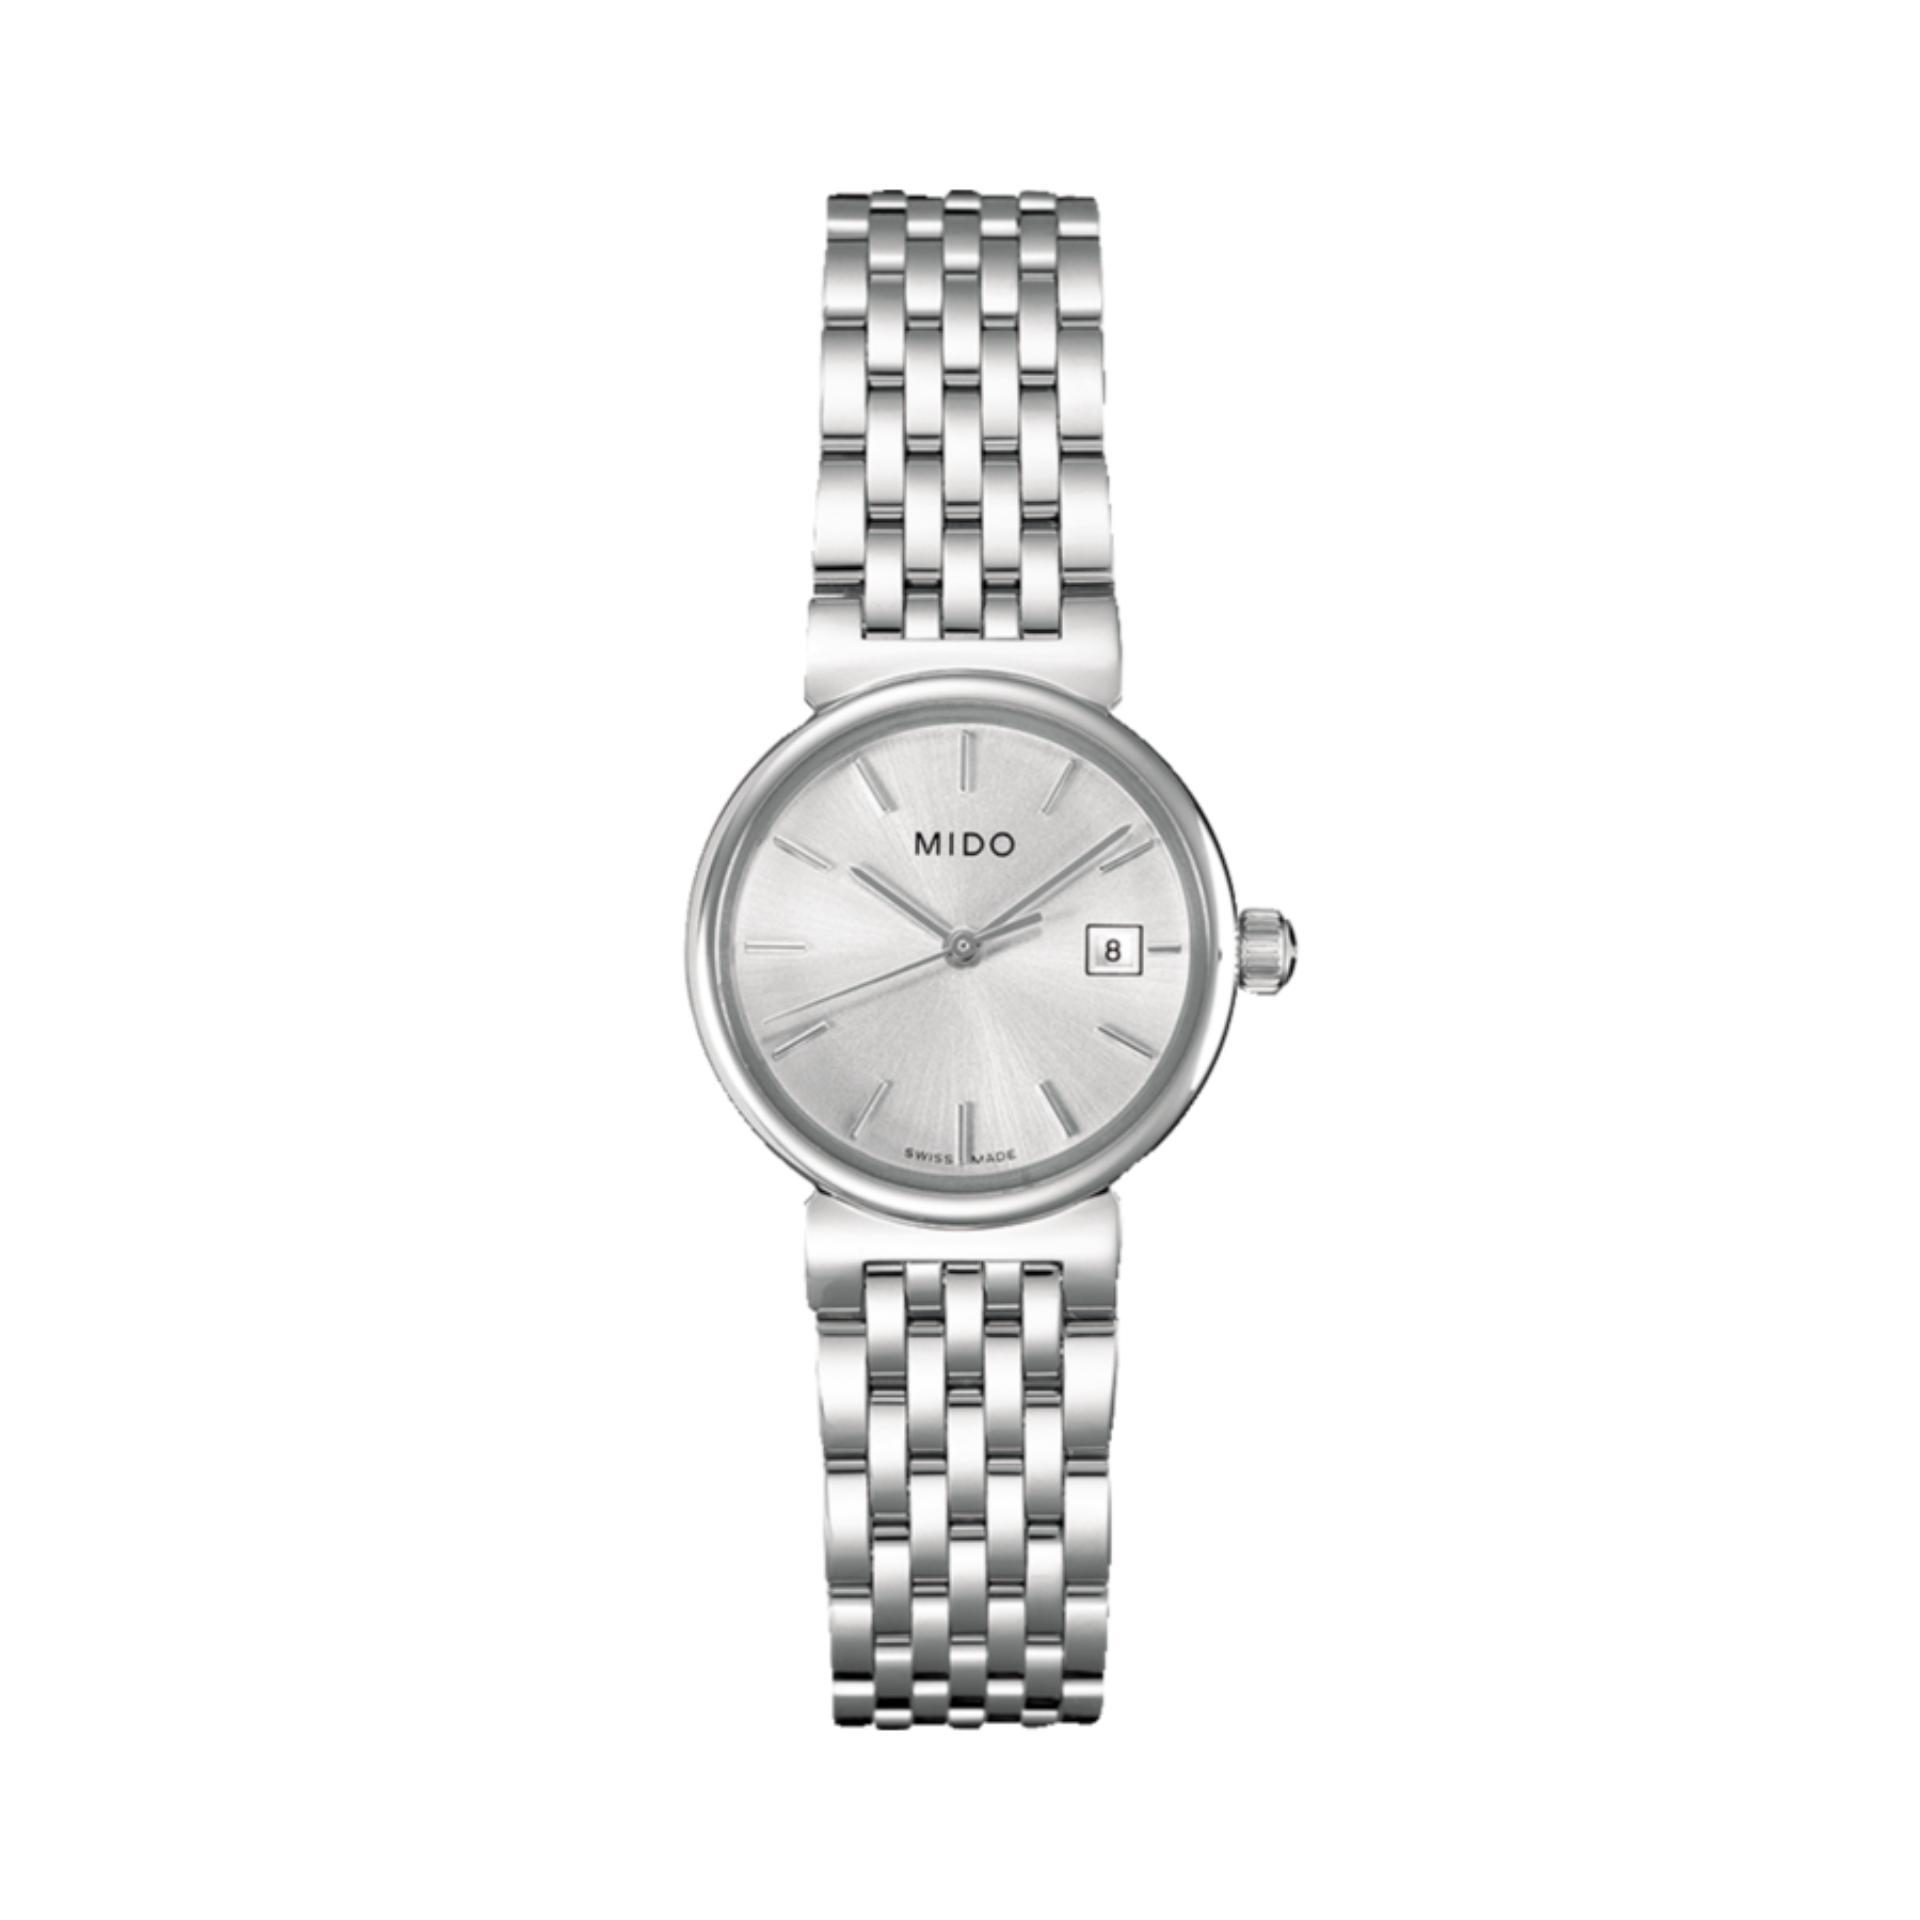 Jam Tangan Mido Dorada Quartz - M2130.4.13.1 - Wanita Swiss Made